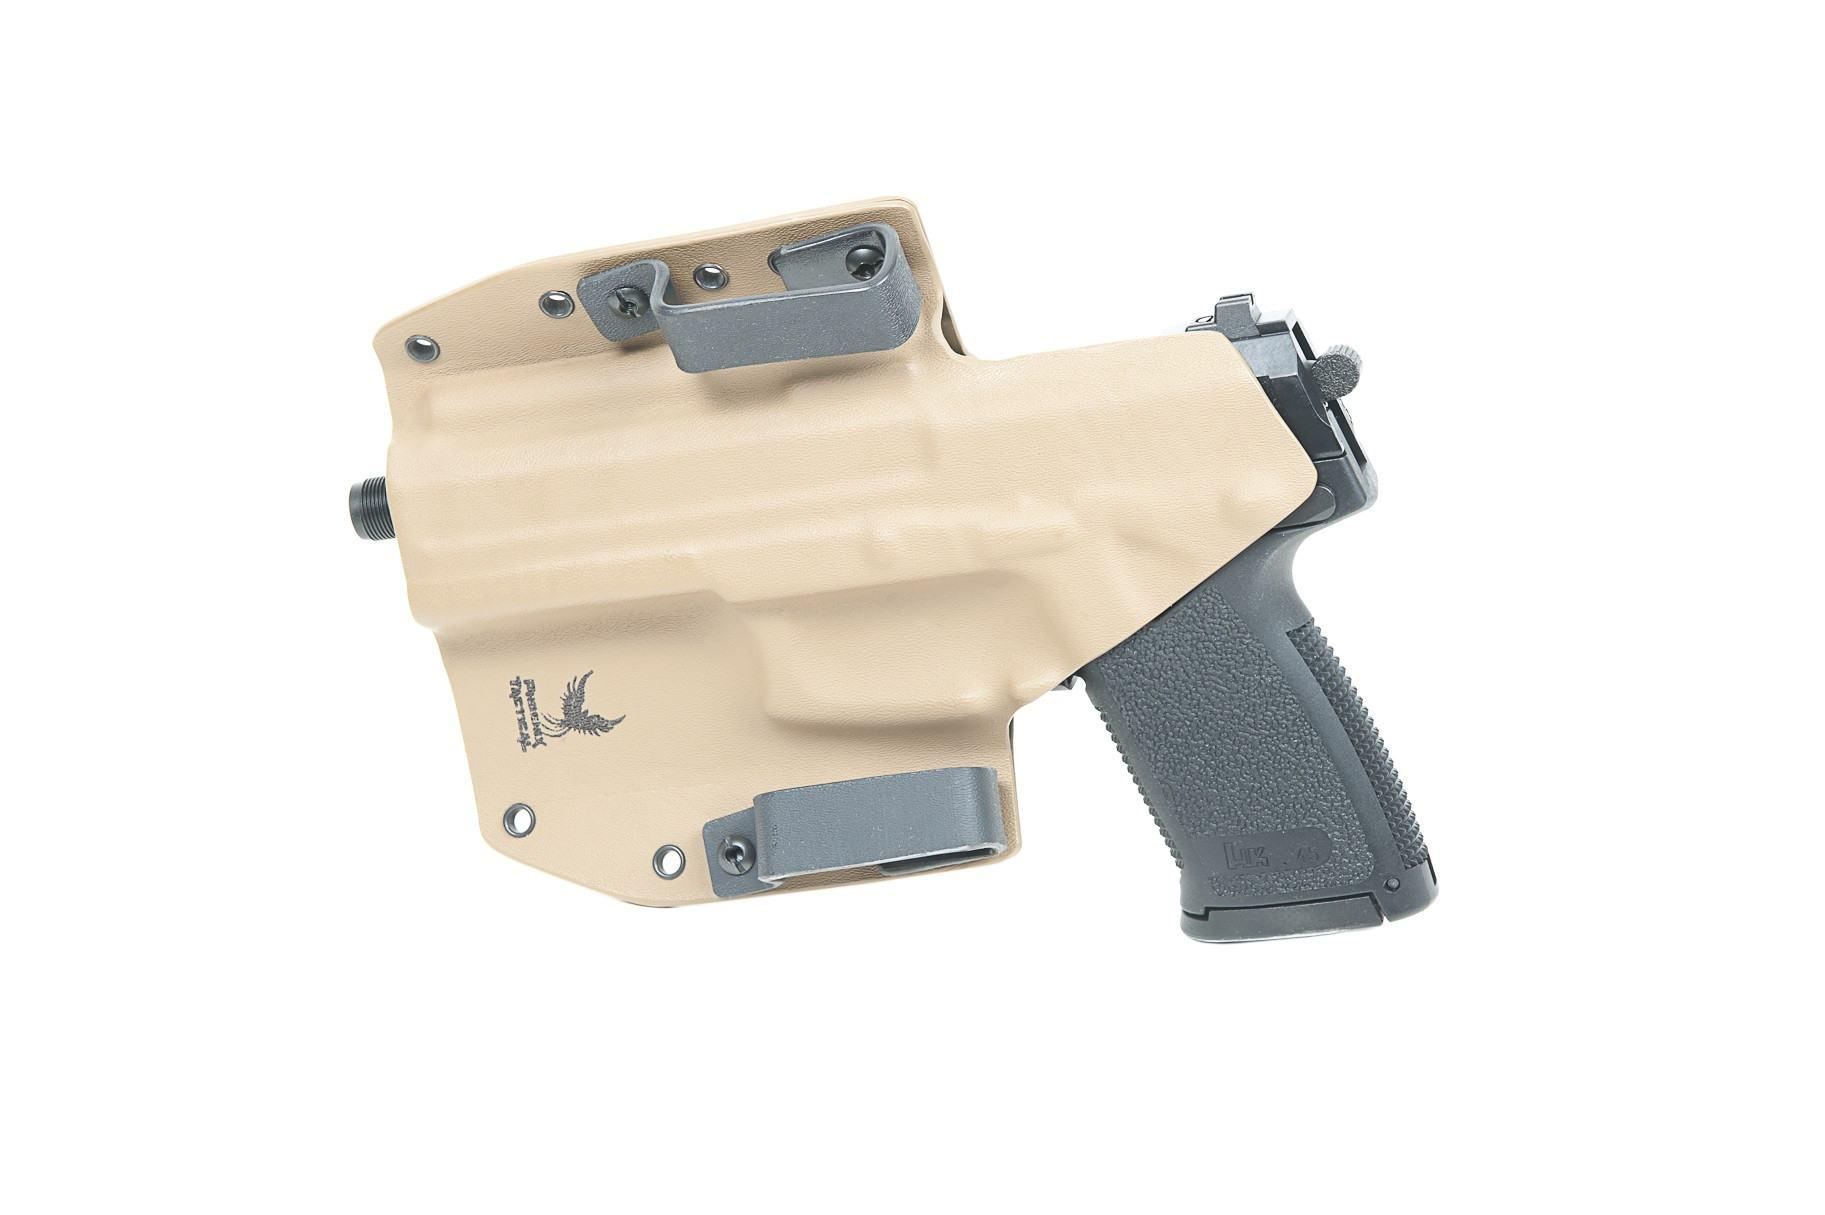 Phoenix Tactical H&K Mk23 Pistol Kydex Alpha Holster - Coyote Brown